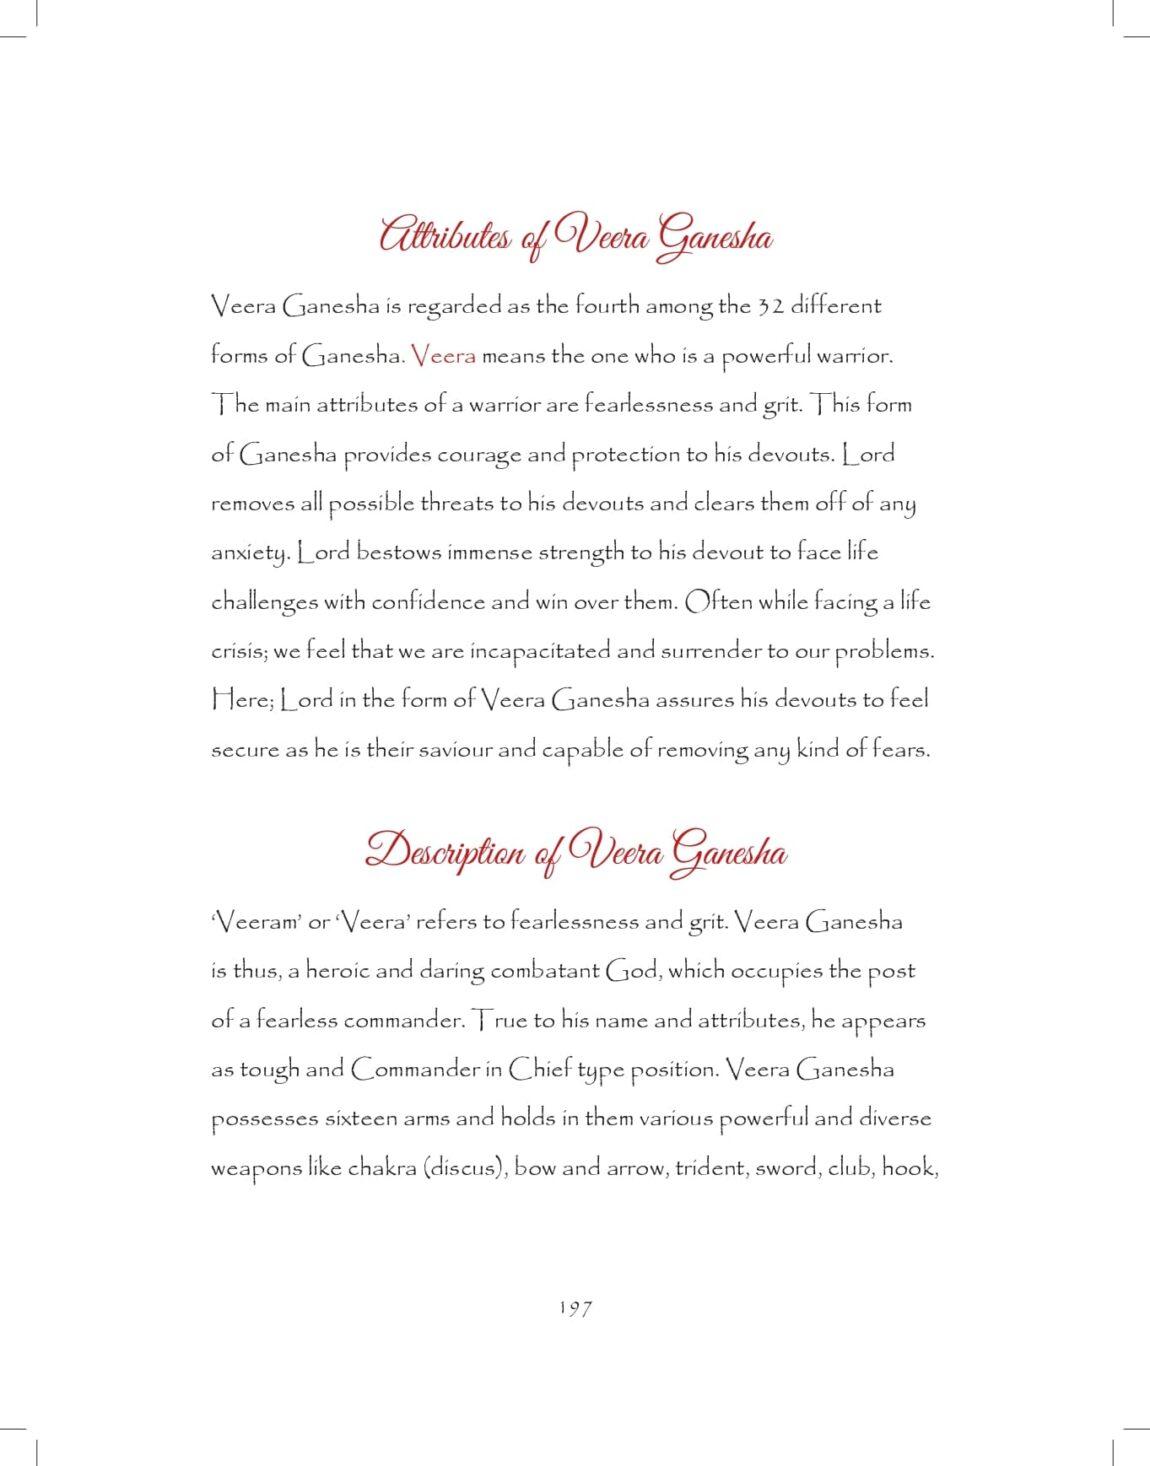 Ganesh-print_pages-to-jpg-0197.jpg